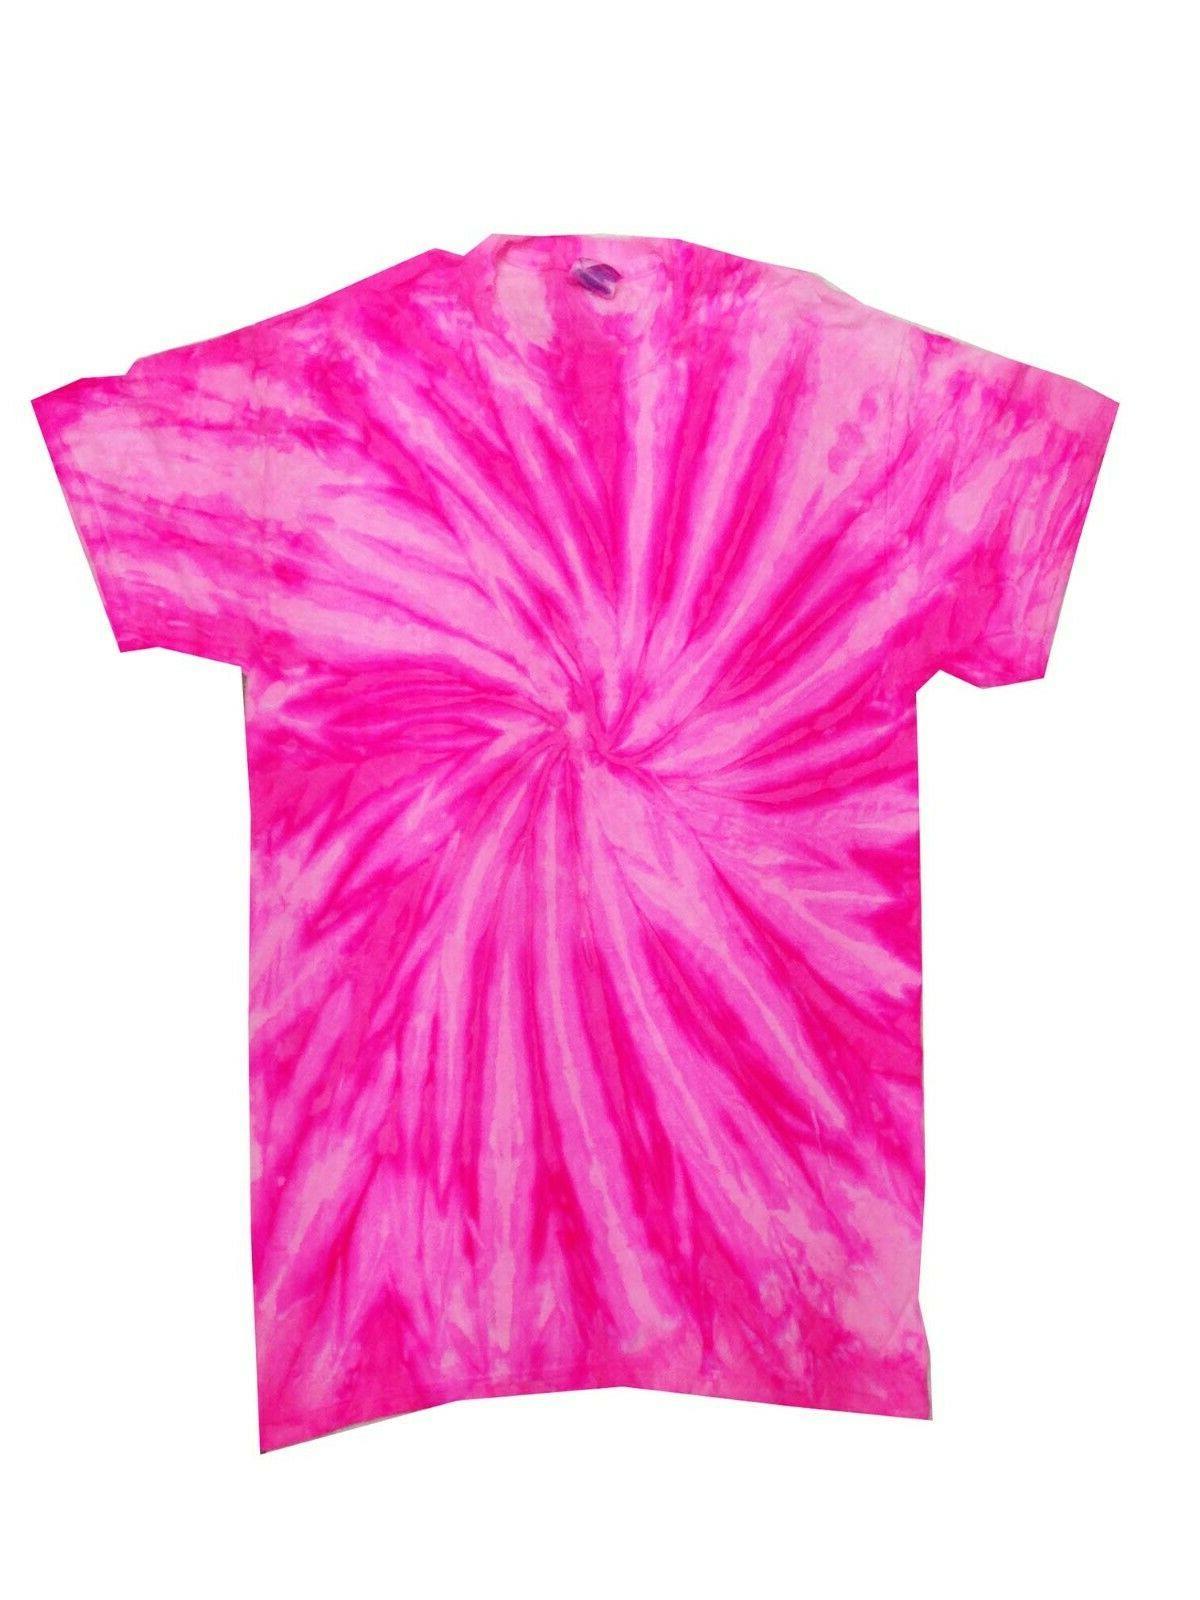 Vibrant Multicolor Tie Dye T-Shirts SM -